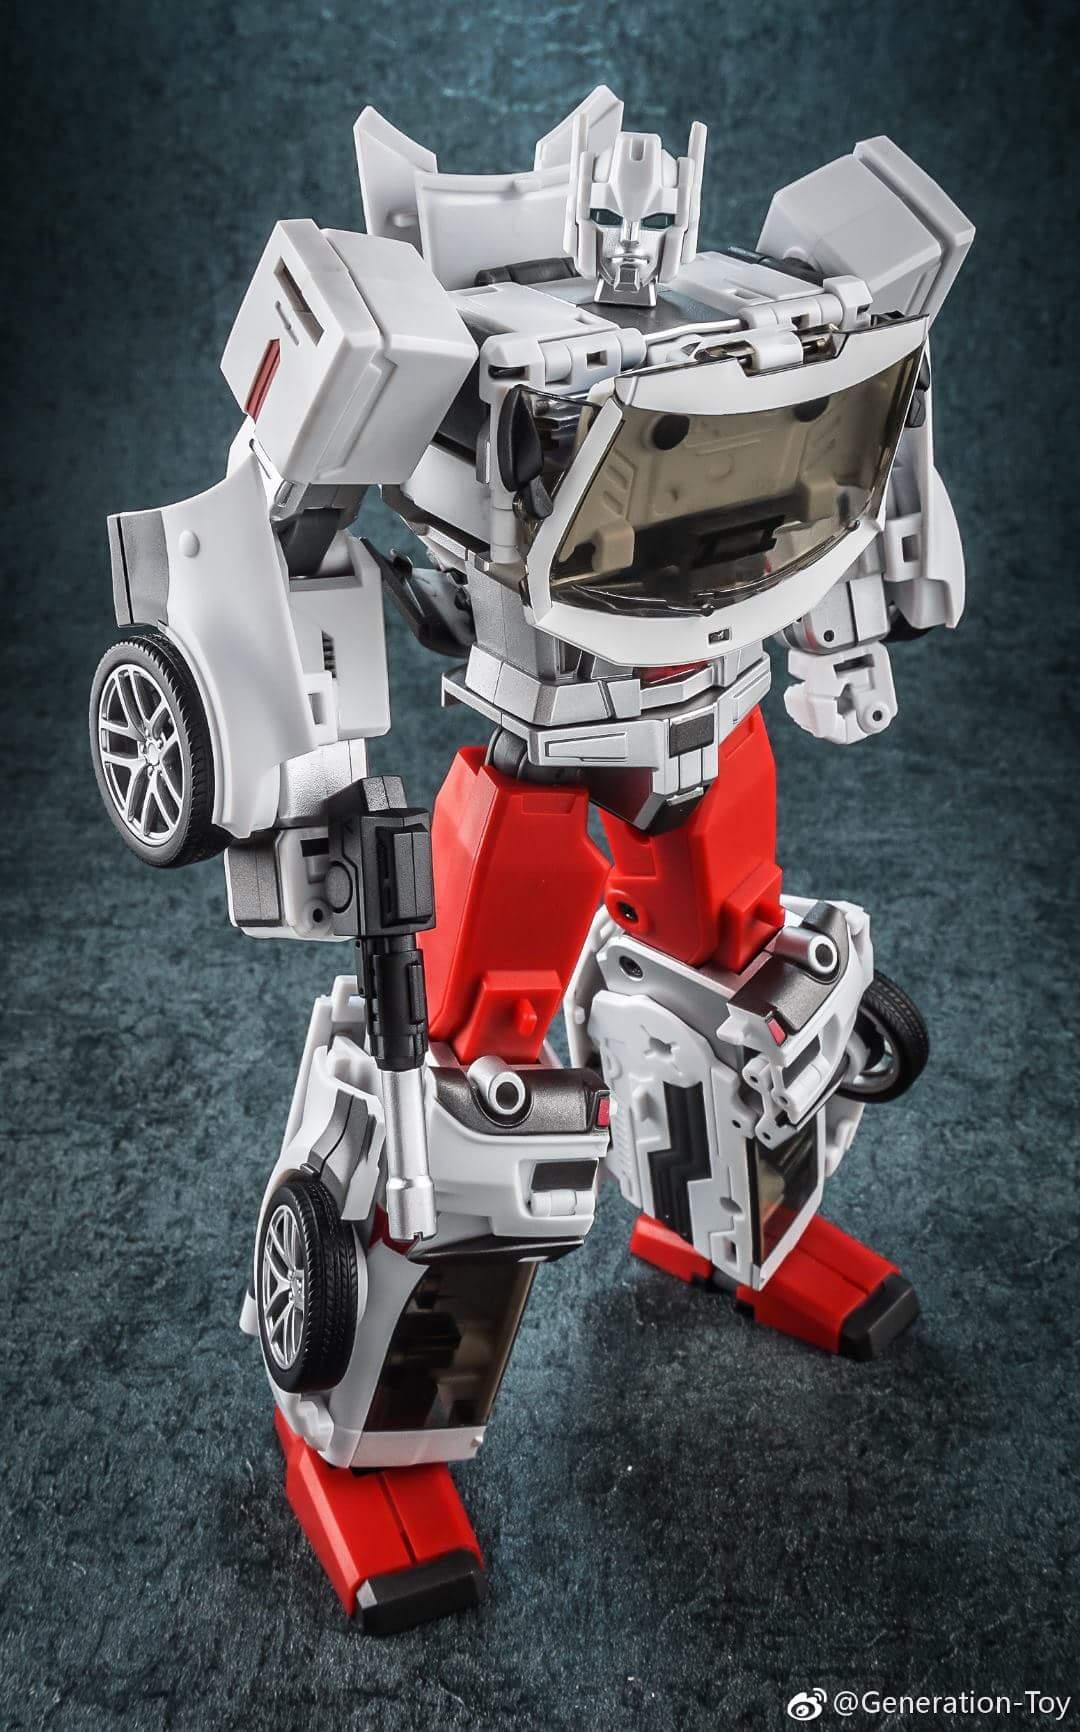 [Generation Toy] Produit Tiers - Jouet GT-08 Guardian - aka Defensor/Defenso RStDddHk_o